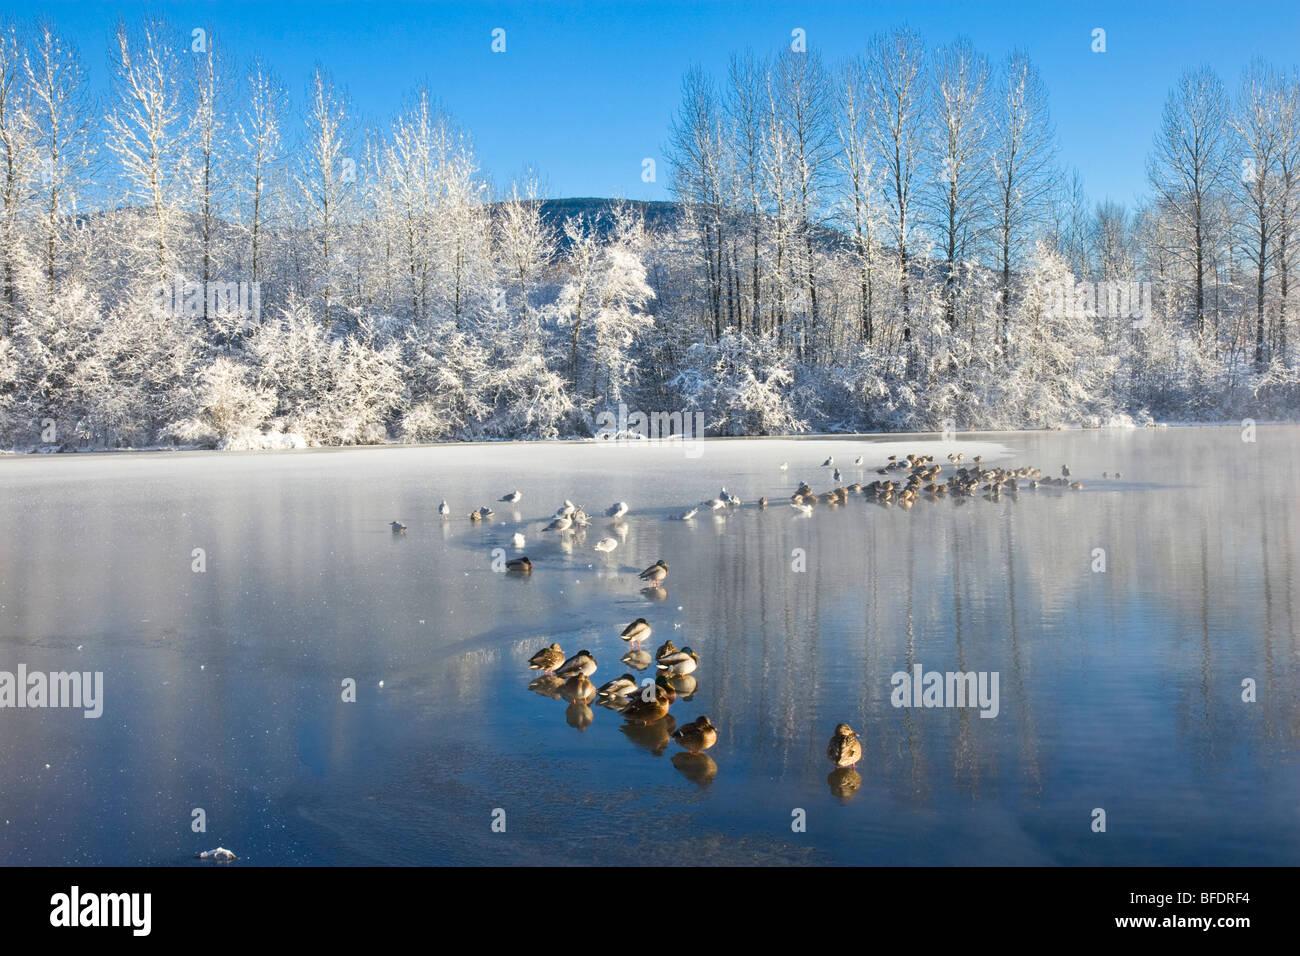 Ducks (Anatidae) on frozen Lafarge Lake at sunrise in Coquitlam, British Columbia, Canada - Stock Image